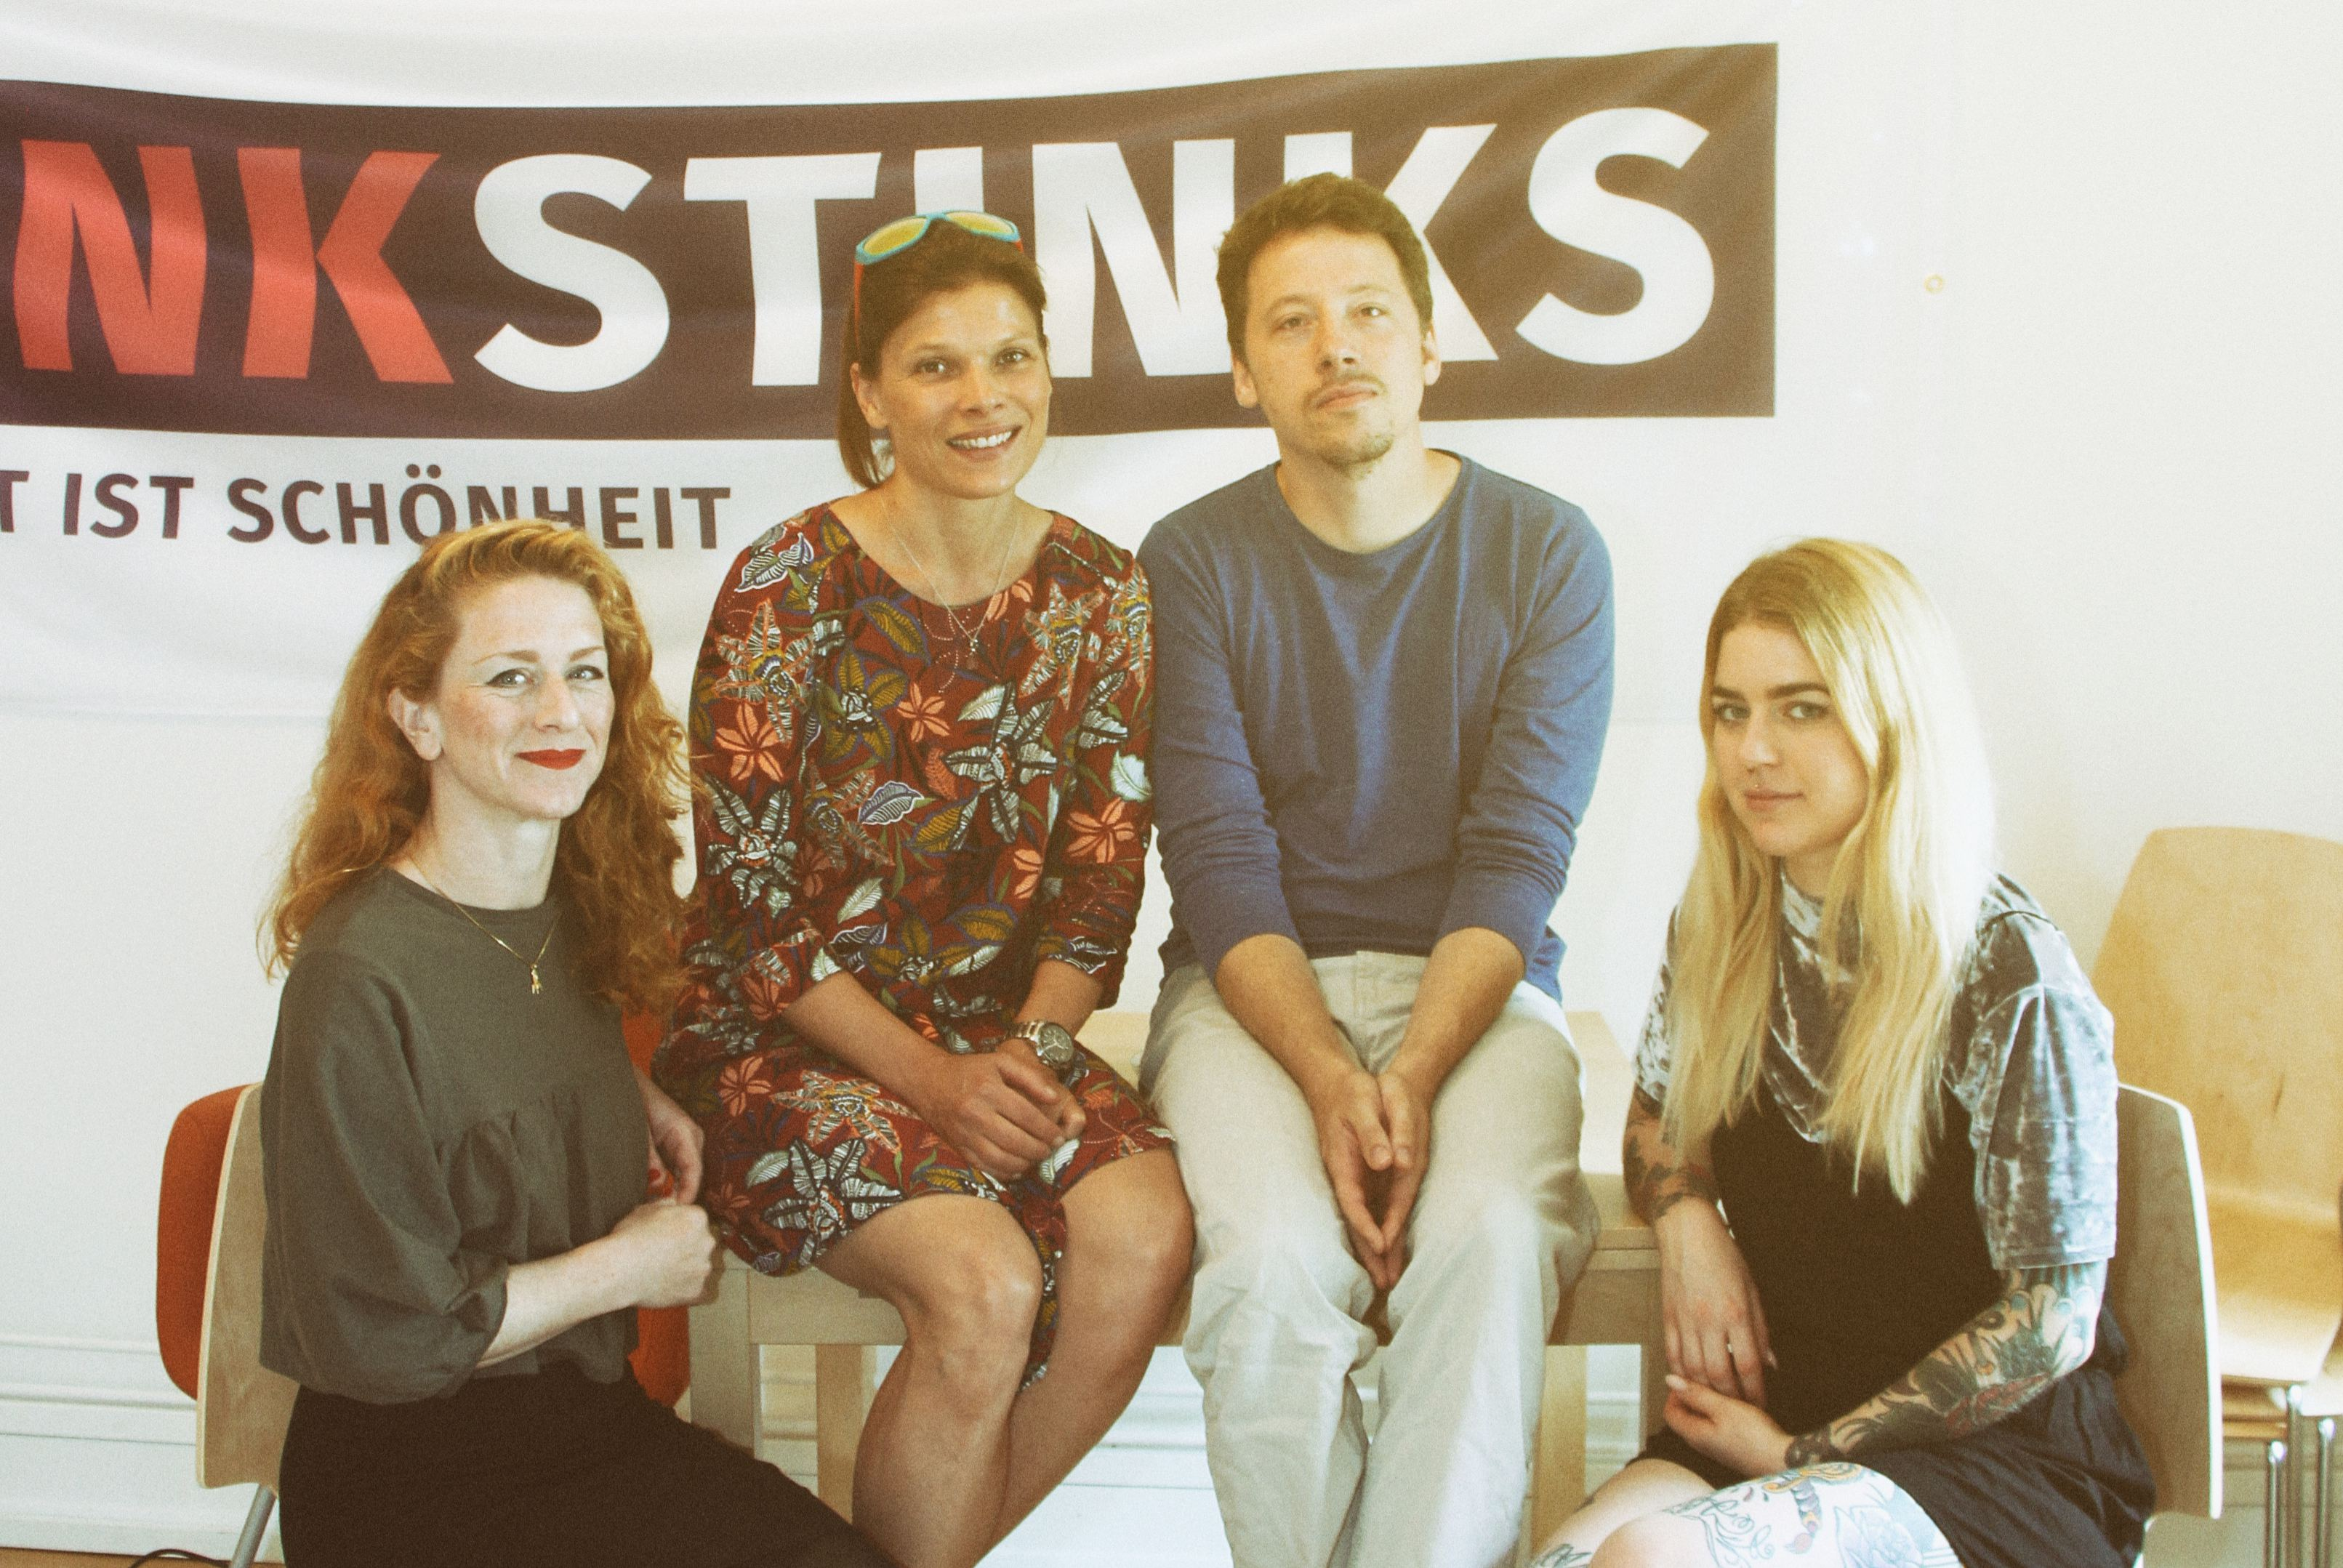 (V. l. n. r.) Ariane Lettow, Stevie Schmiedel, Nils Pickert und Gina Nicolini. Foto: Fabian Hennig